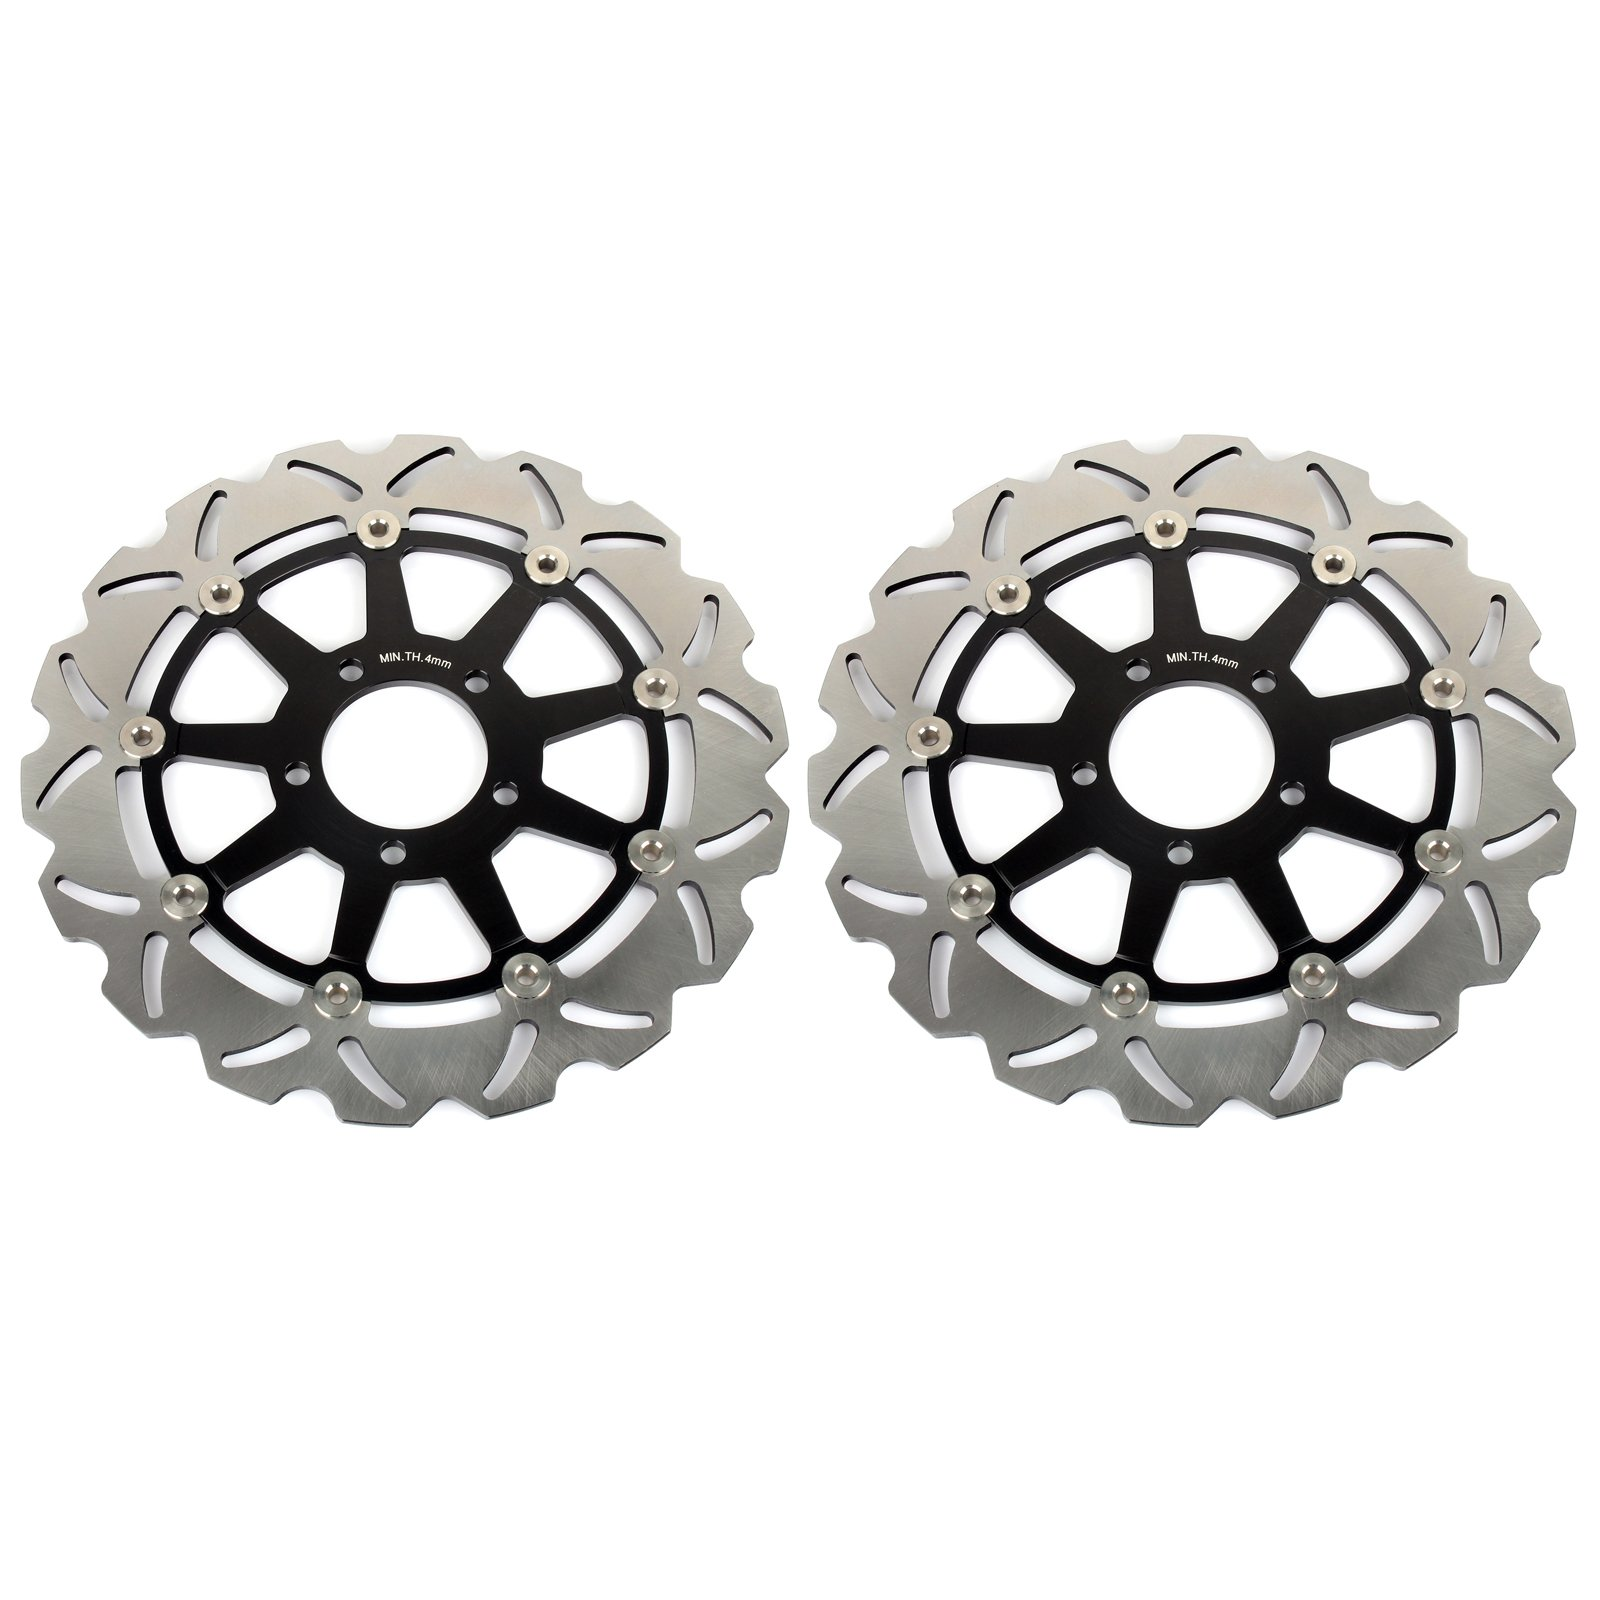 GSXR Front Brake Discs Rotors for Suzuki GSXR600 GSXR750 1997-2003 GSXR1000 2001 2002 Hayabusa GSX1300R 1999-2007 TL1000R TL1000S 98-01 by TARAZON (Image #1)